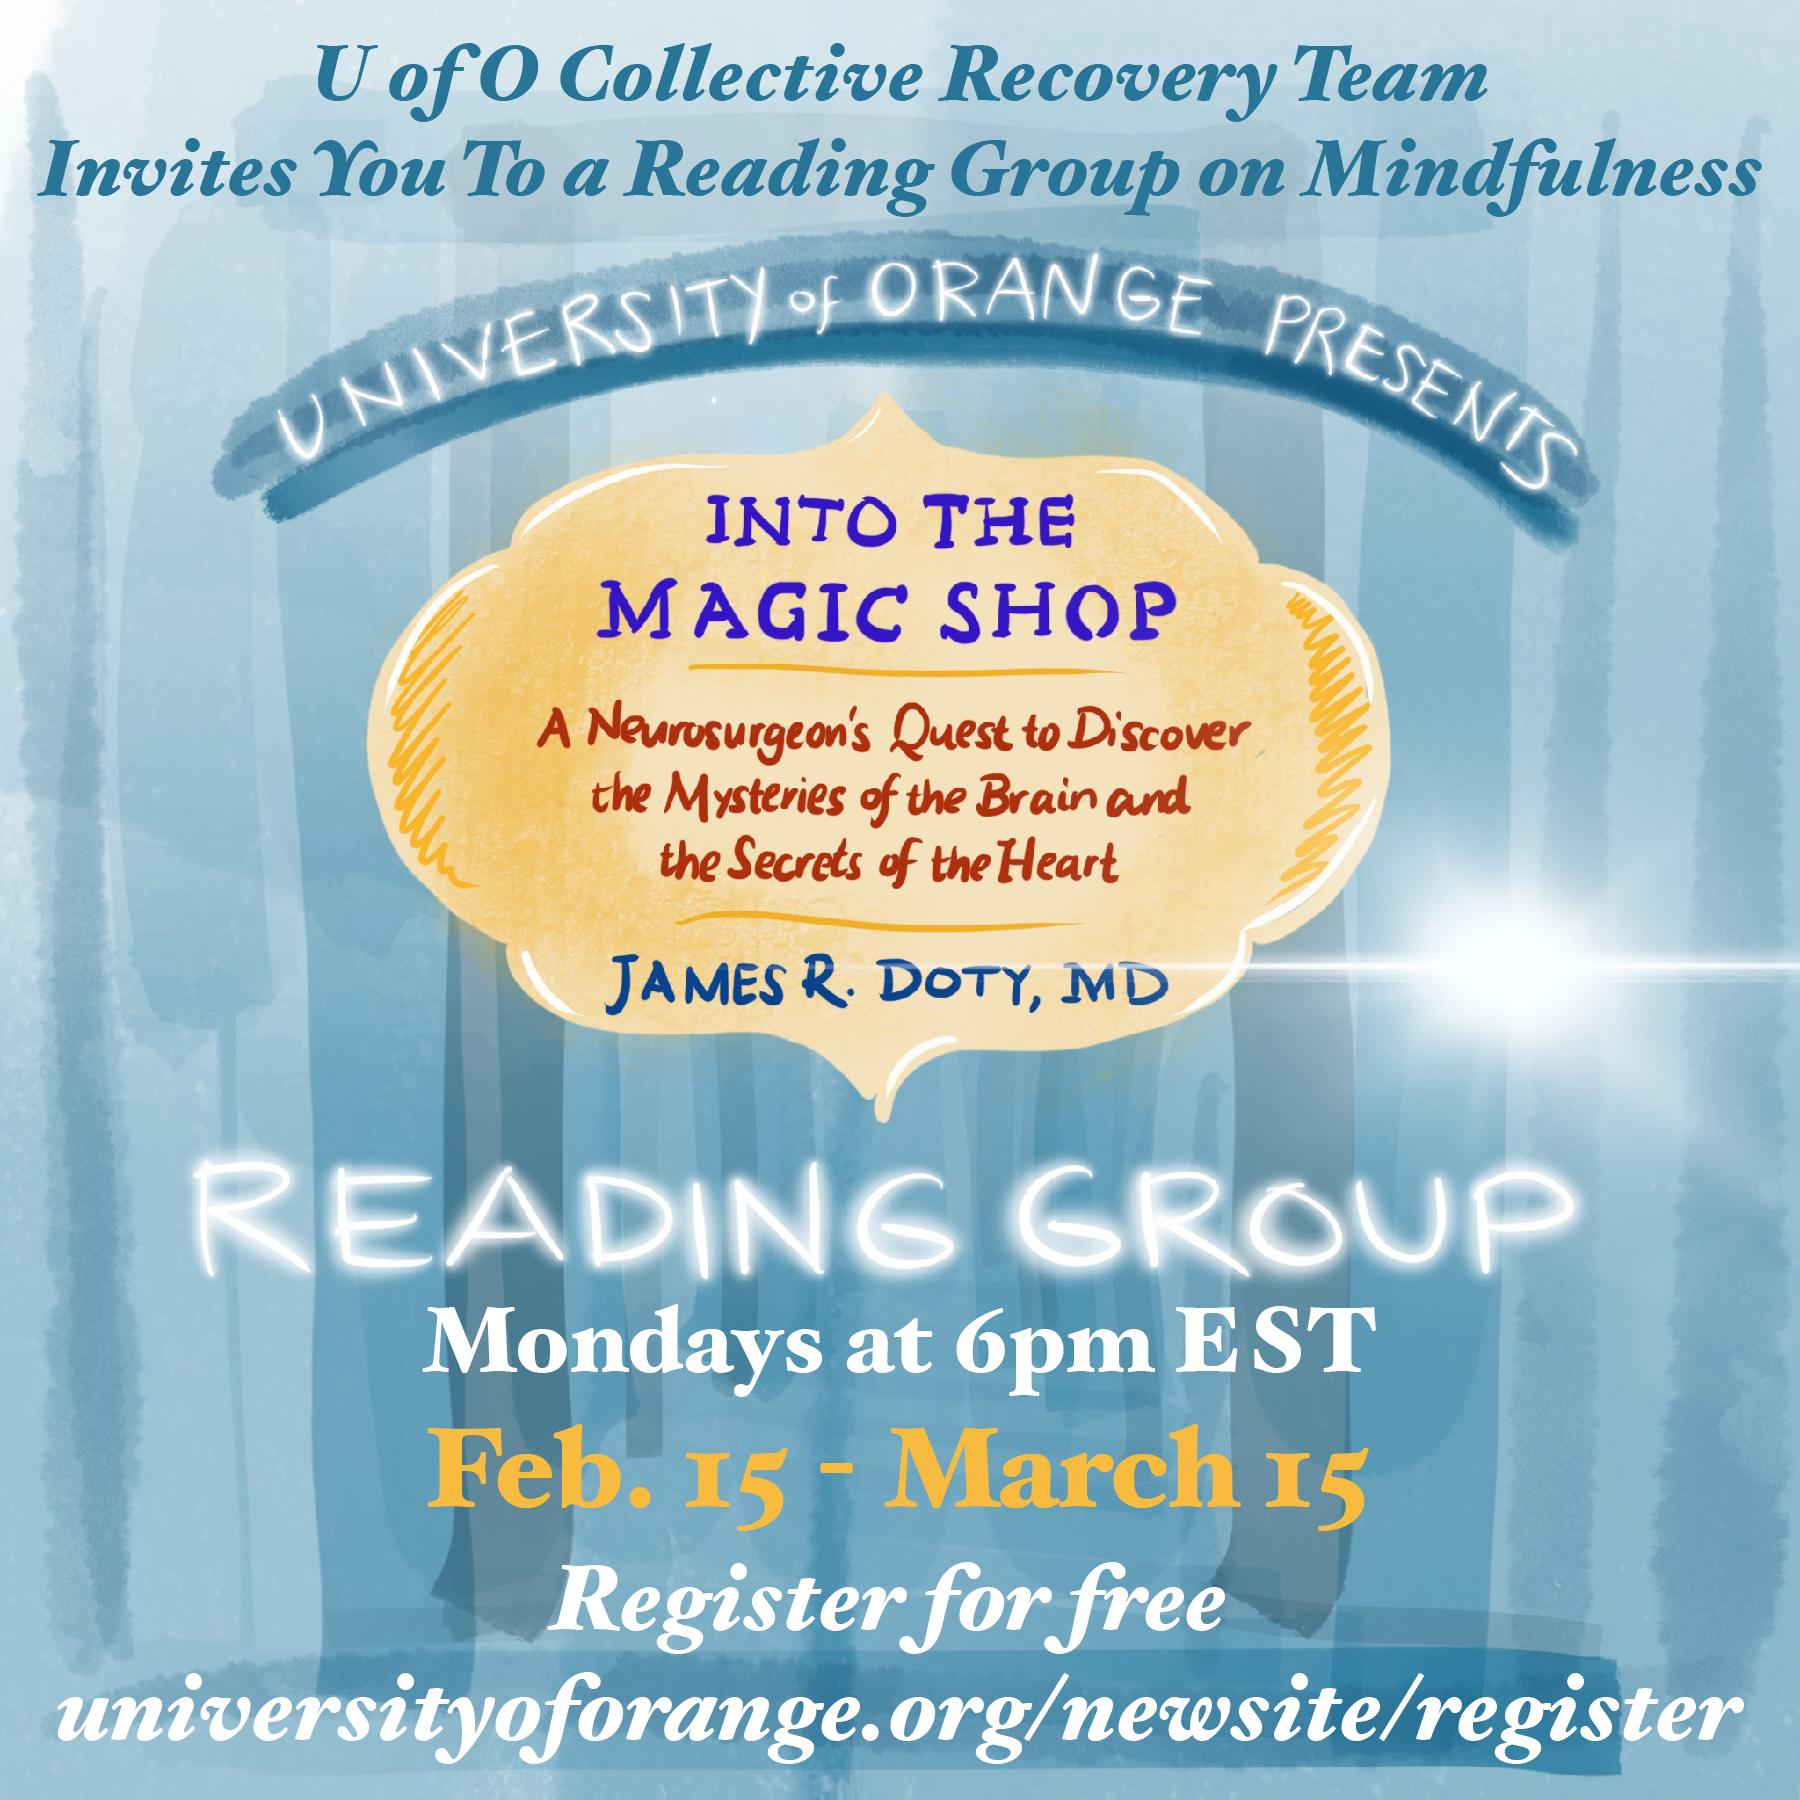 UofO-2021-Reading-Group-Into-Magic-Shop-01-edited